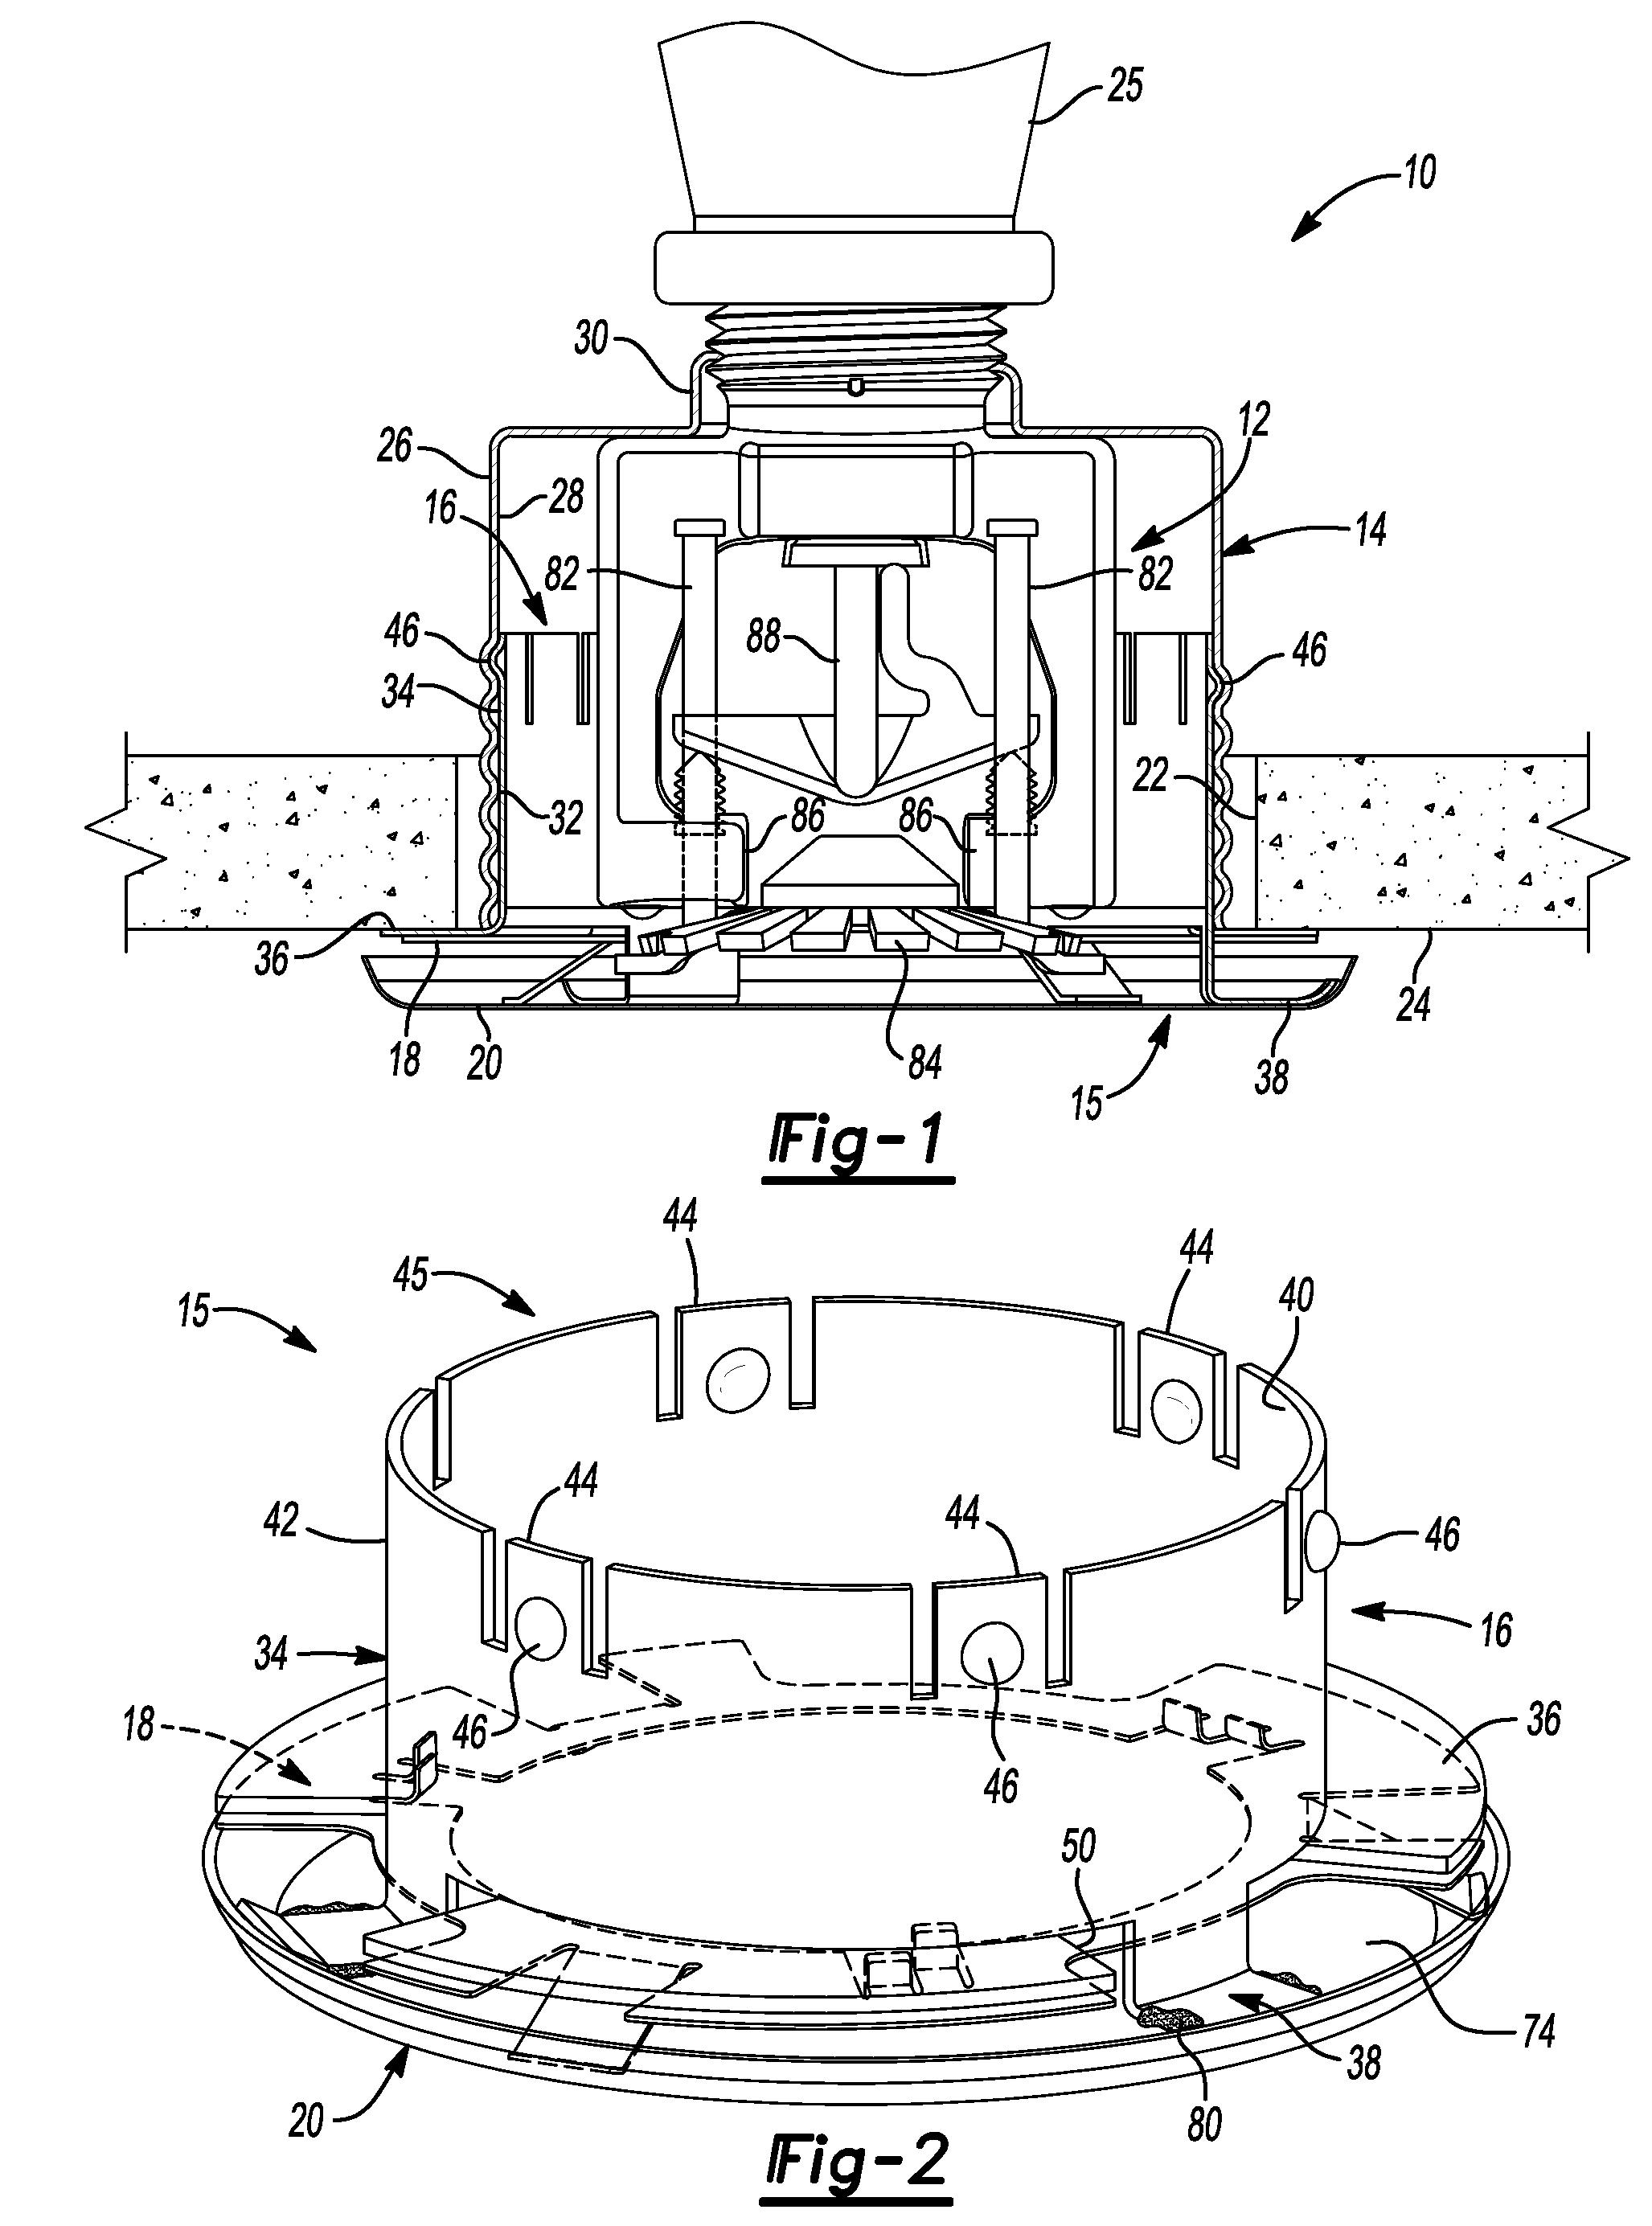 patent us8176987 - self-aligning cover spring for a concealed sprinkler